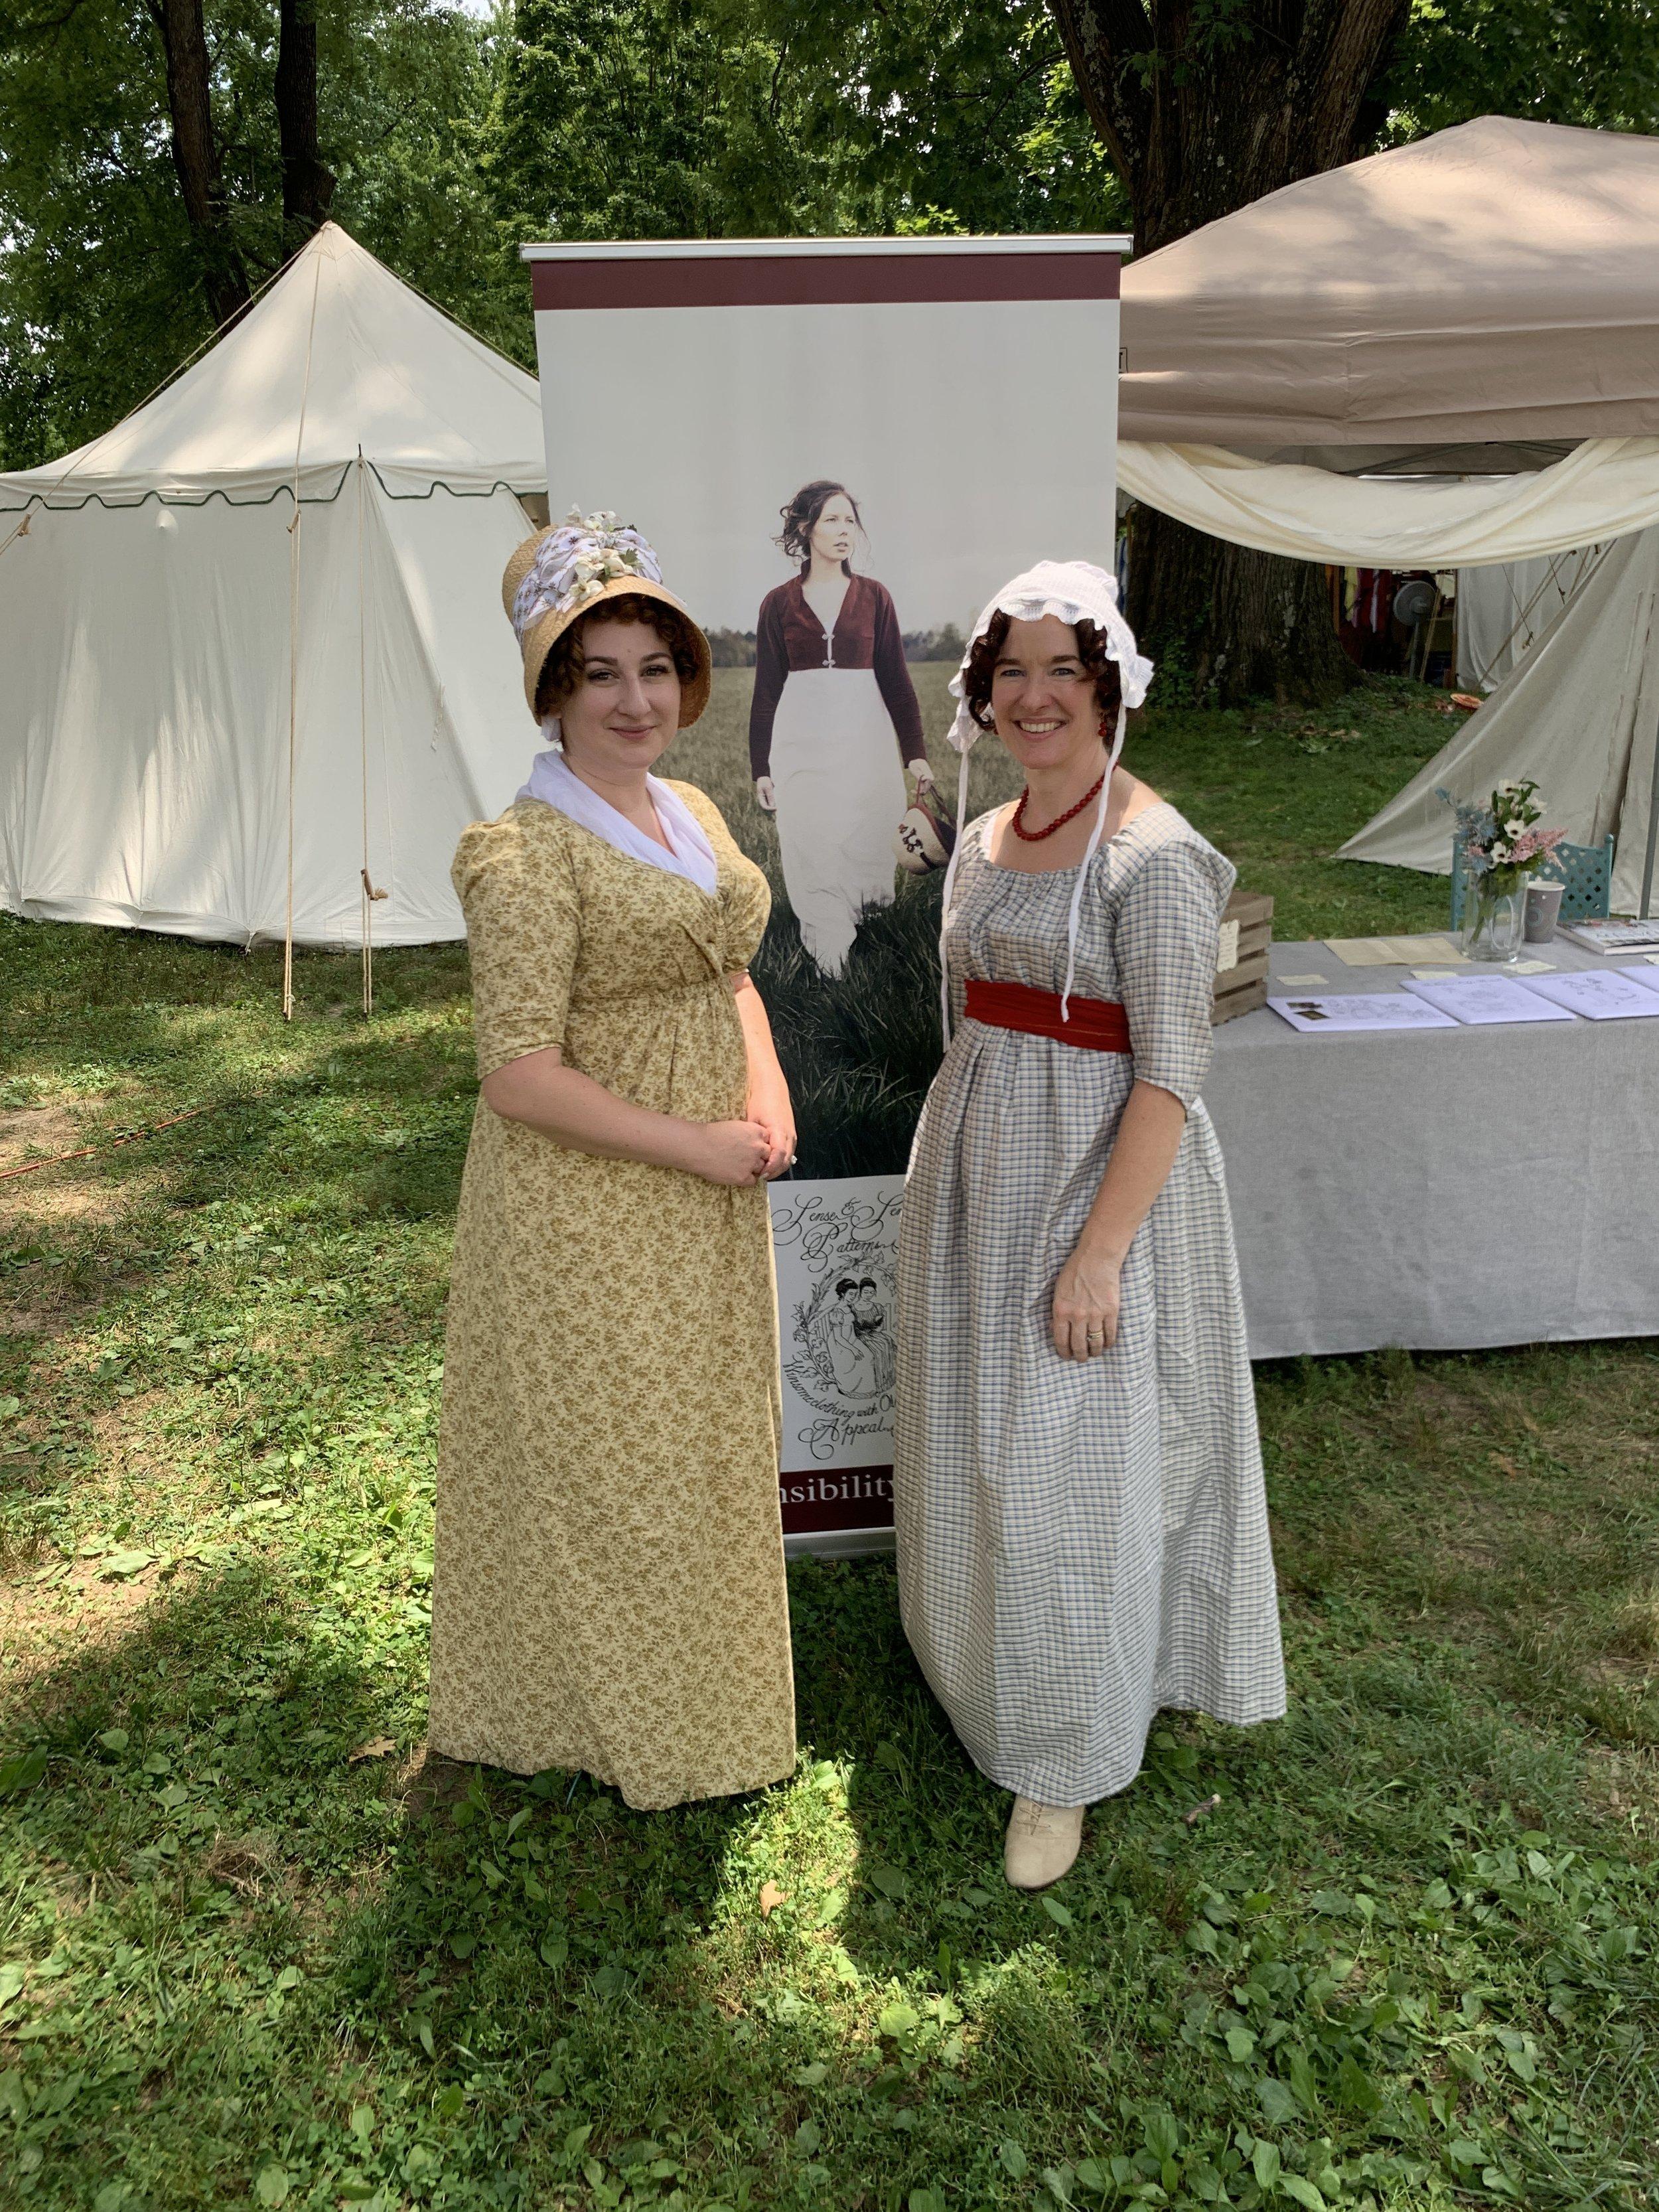 Jane Austen Festival Louisville Kentucky 2019 Sense and Sensibility Patterns